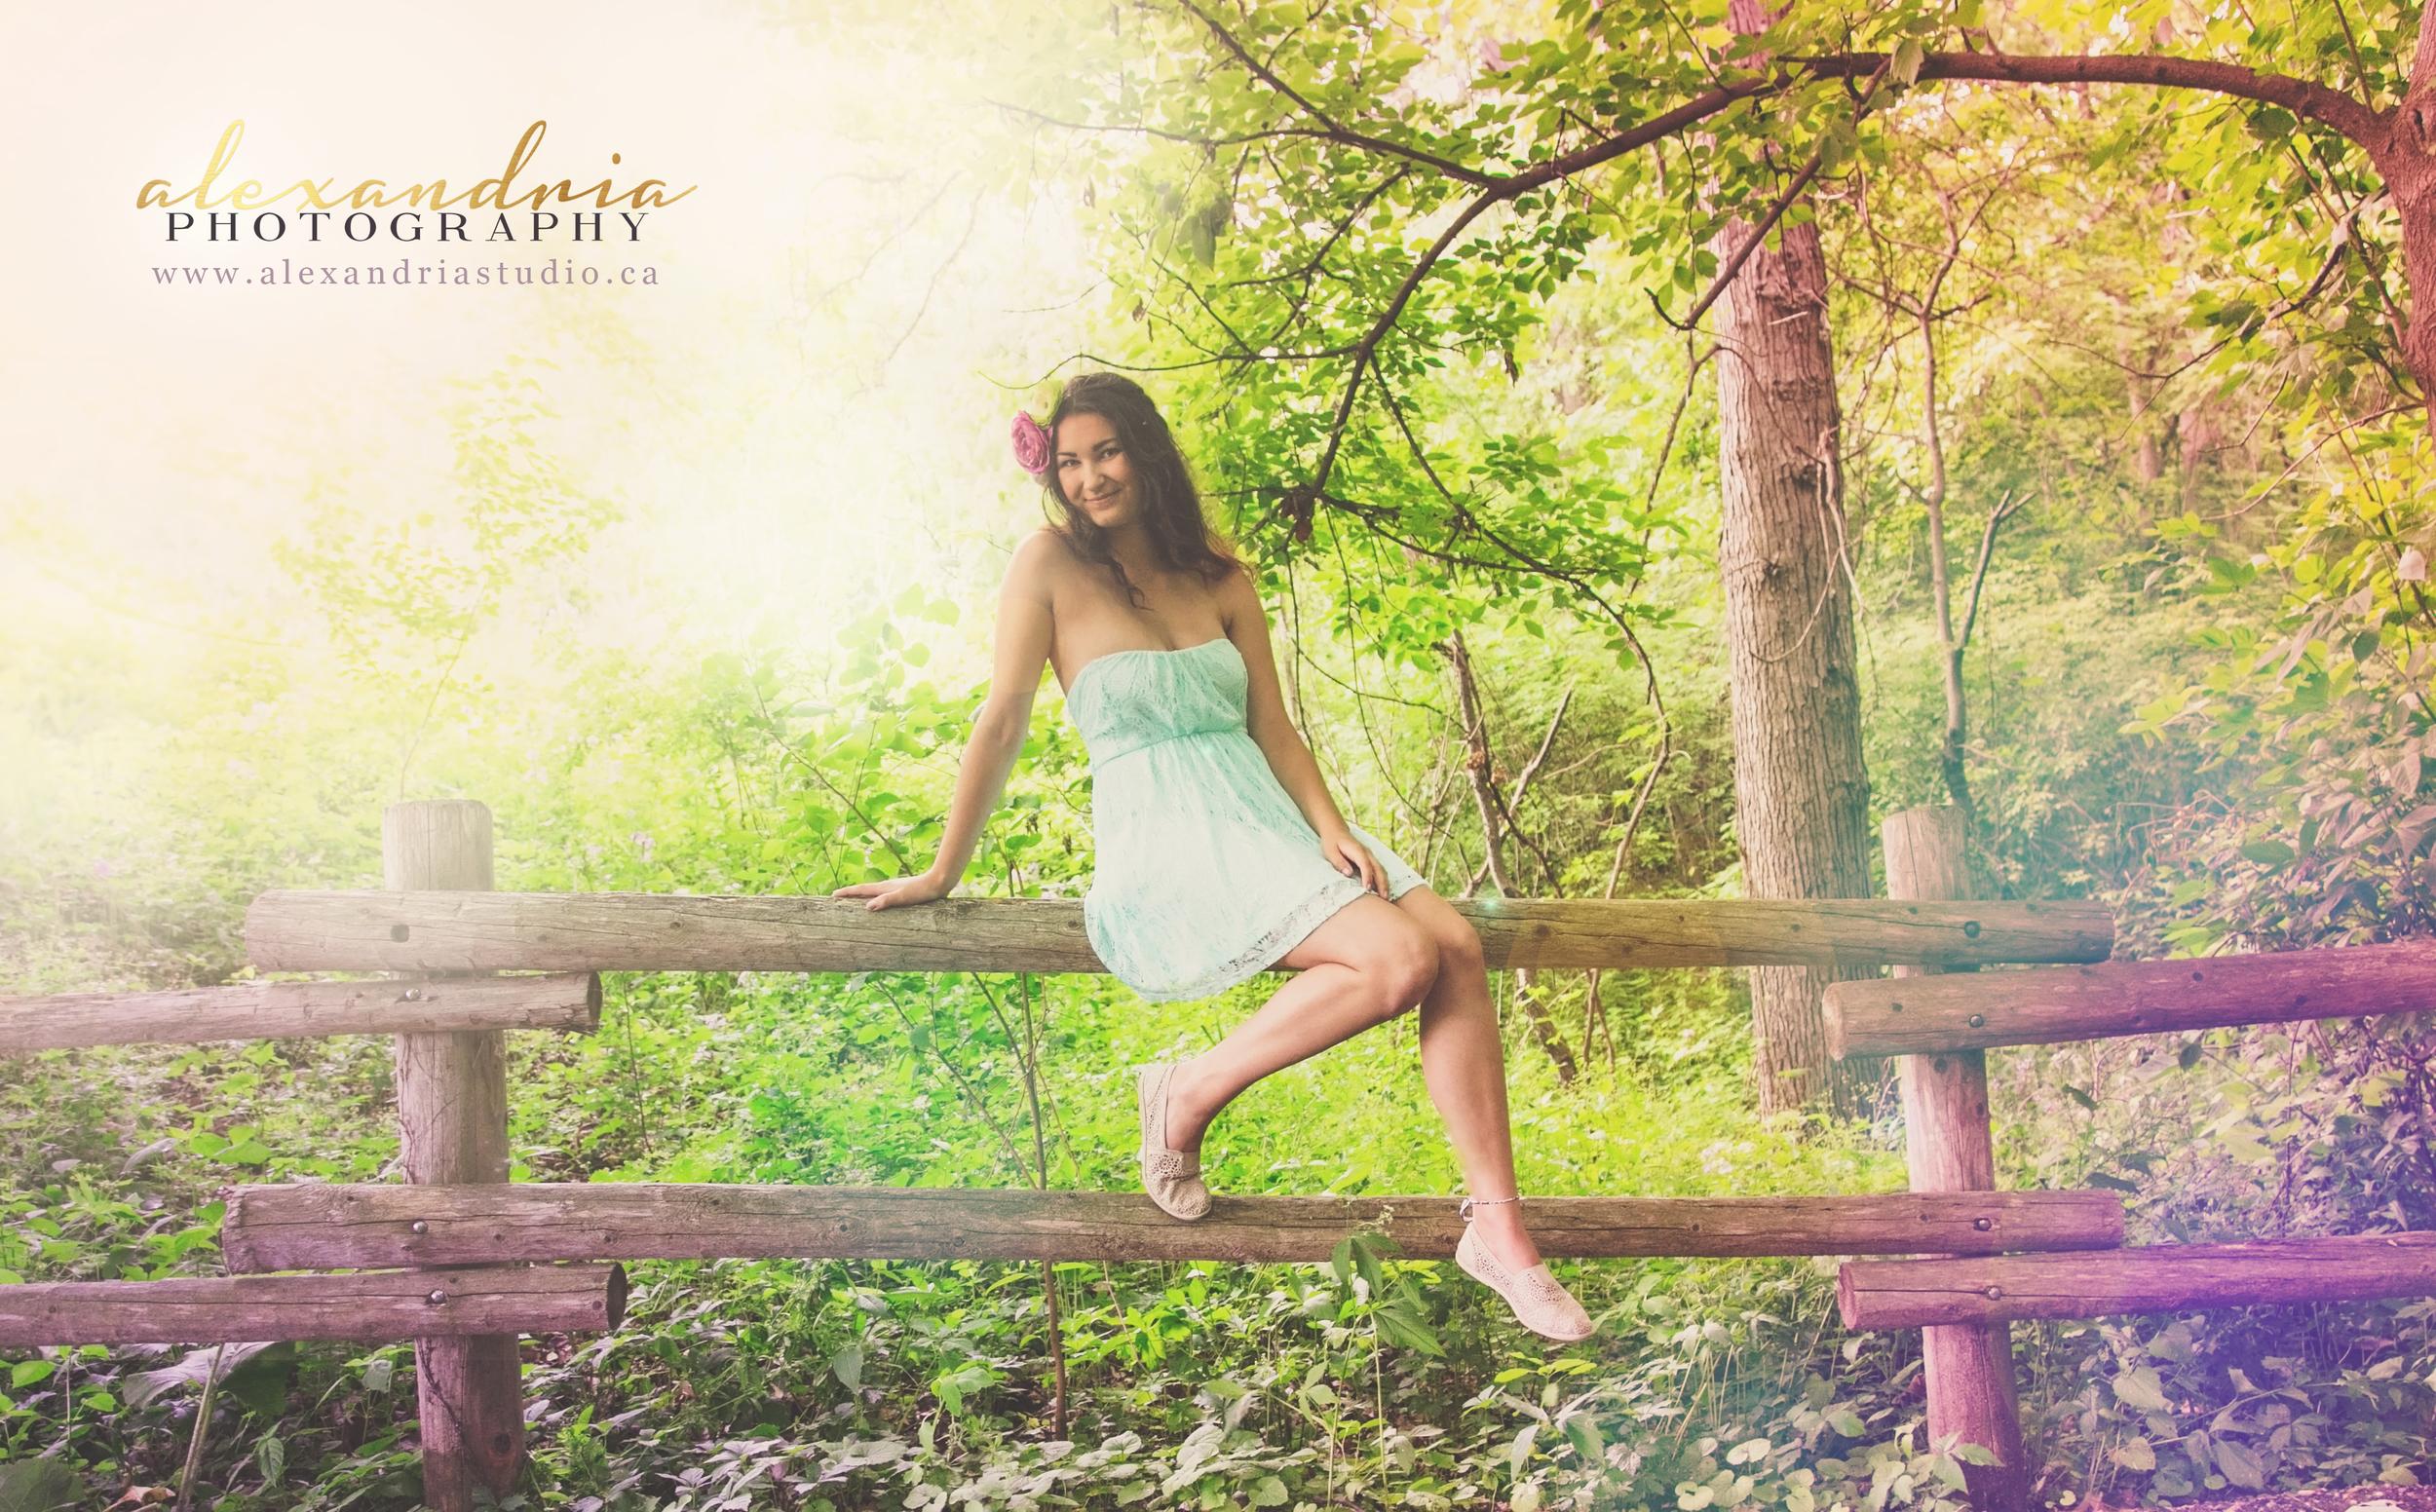 WMedit2Alexandria Photography www.alexandriastudio.ca IMG_9245.jpg